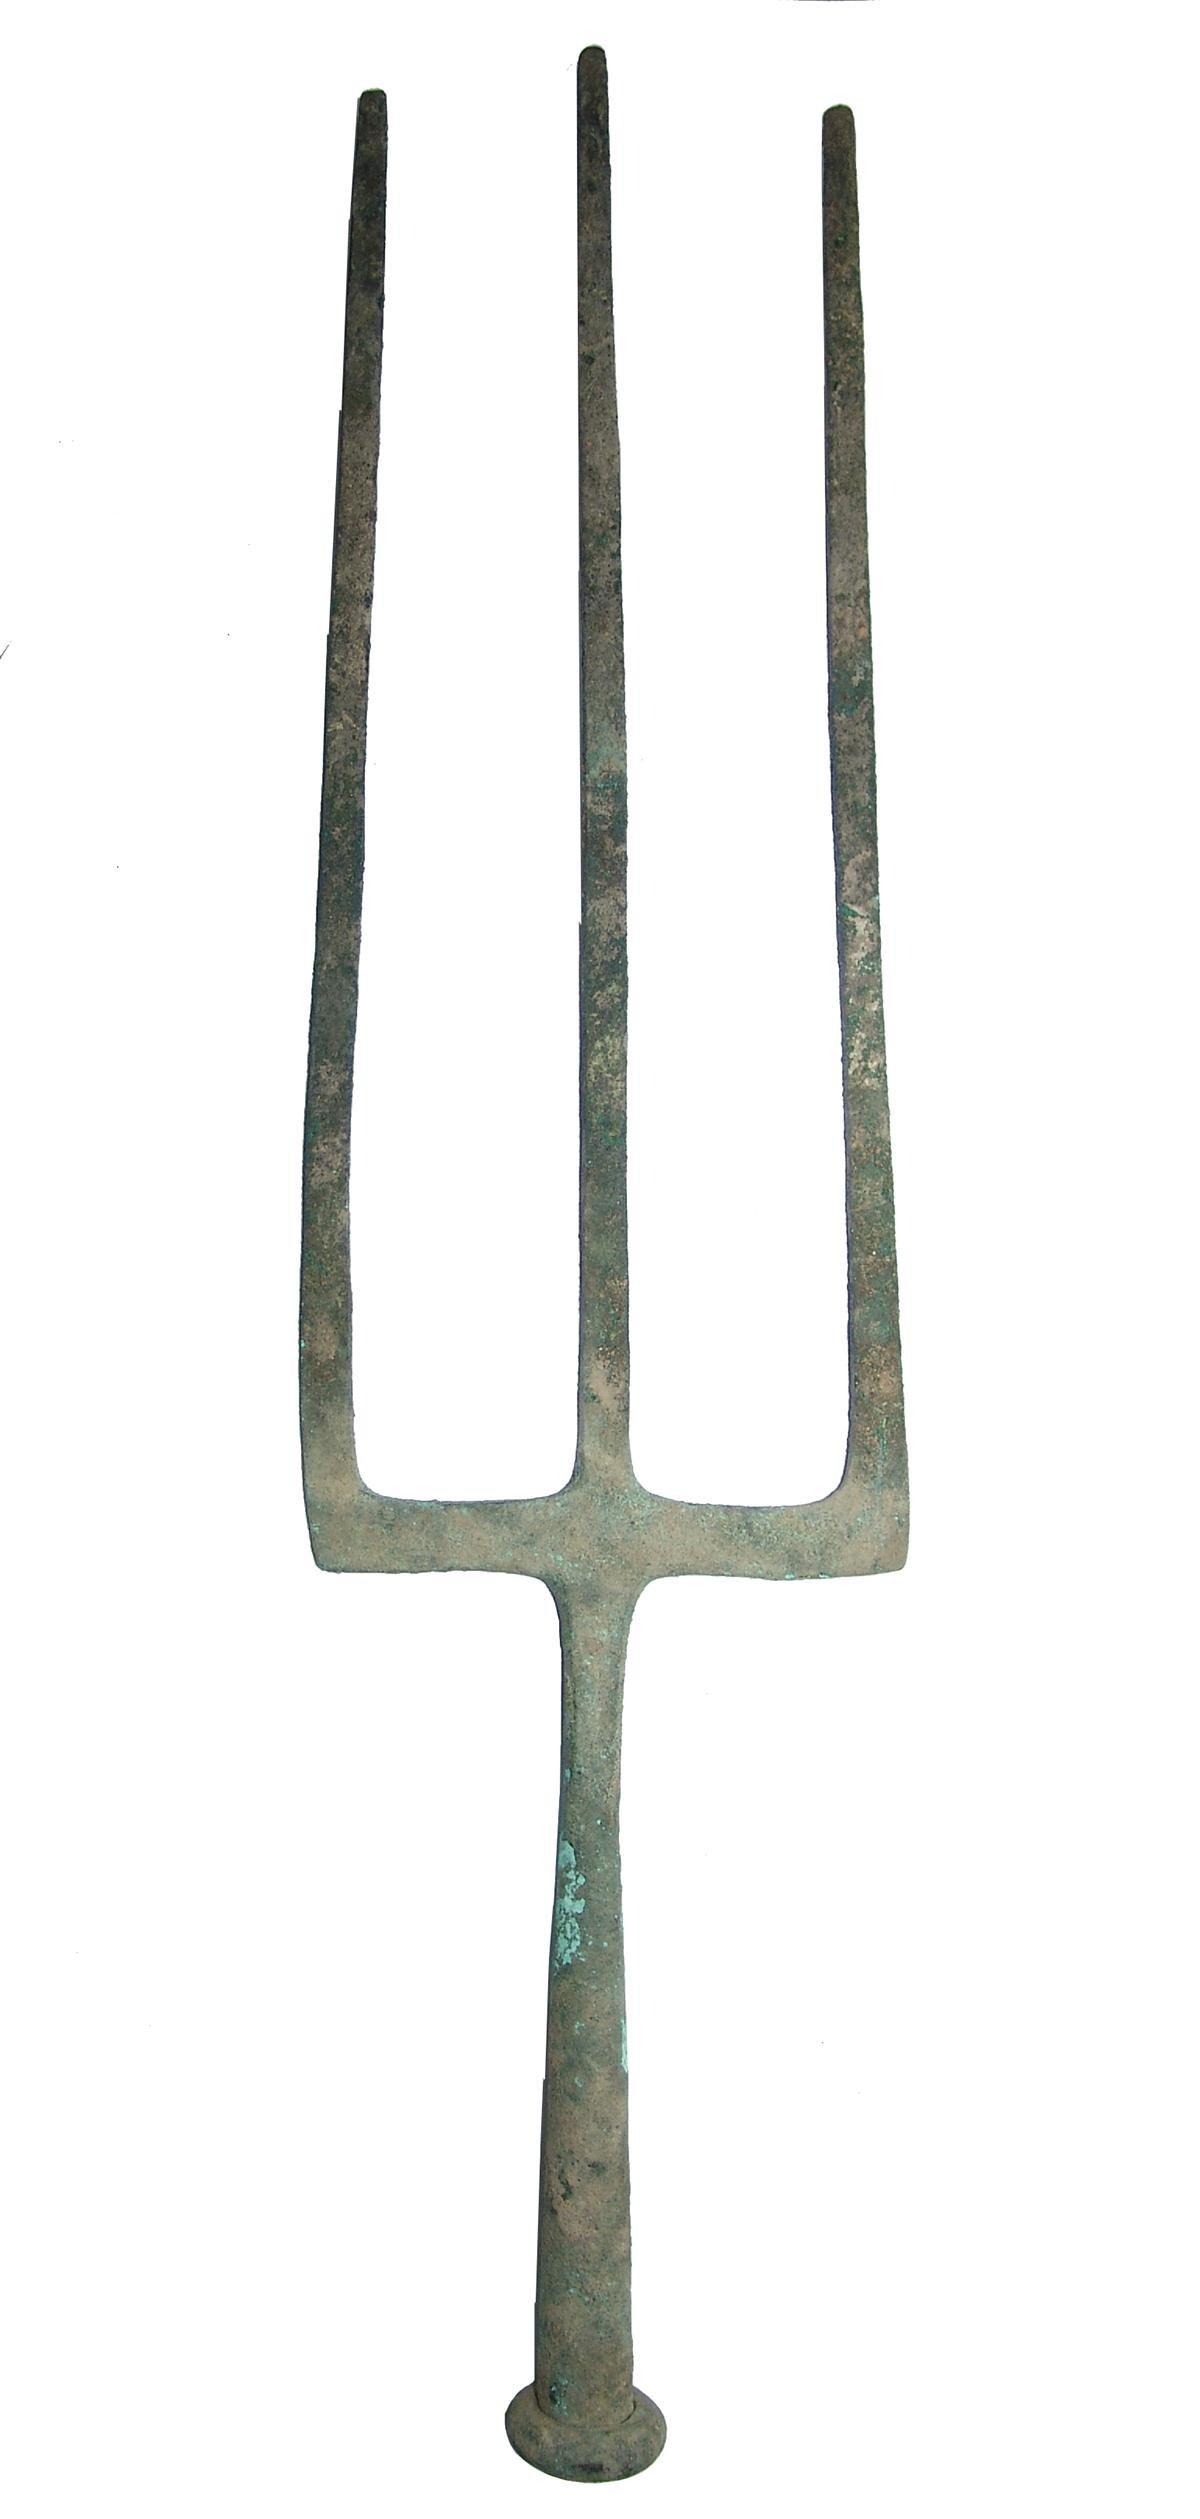 A massive Hellenistic bronze trident